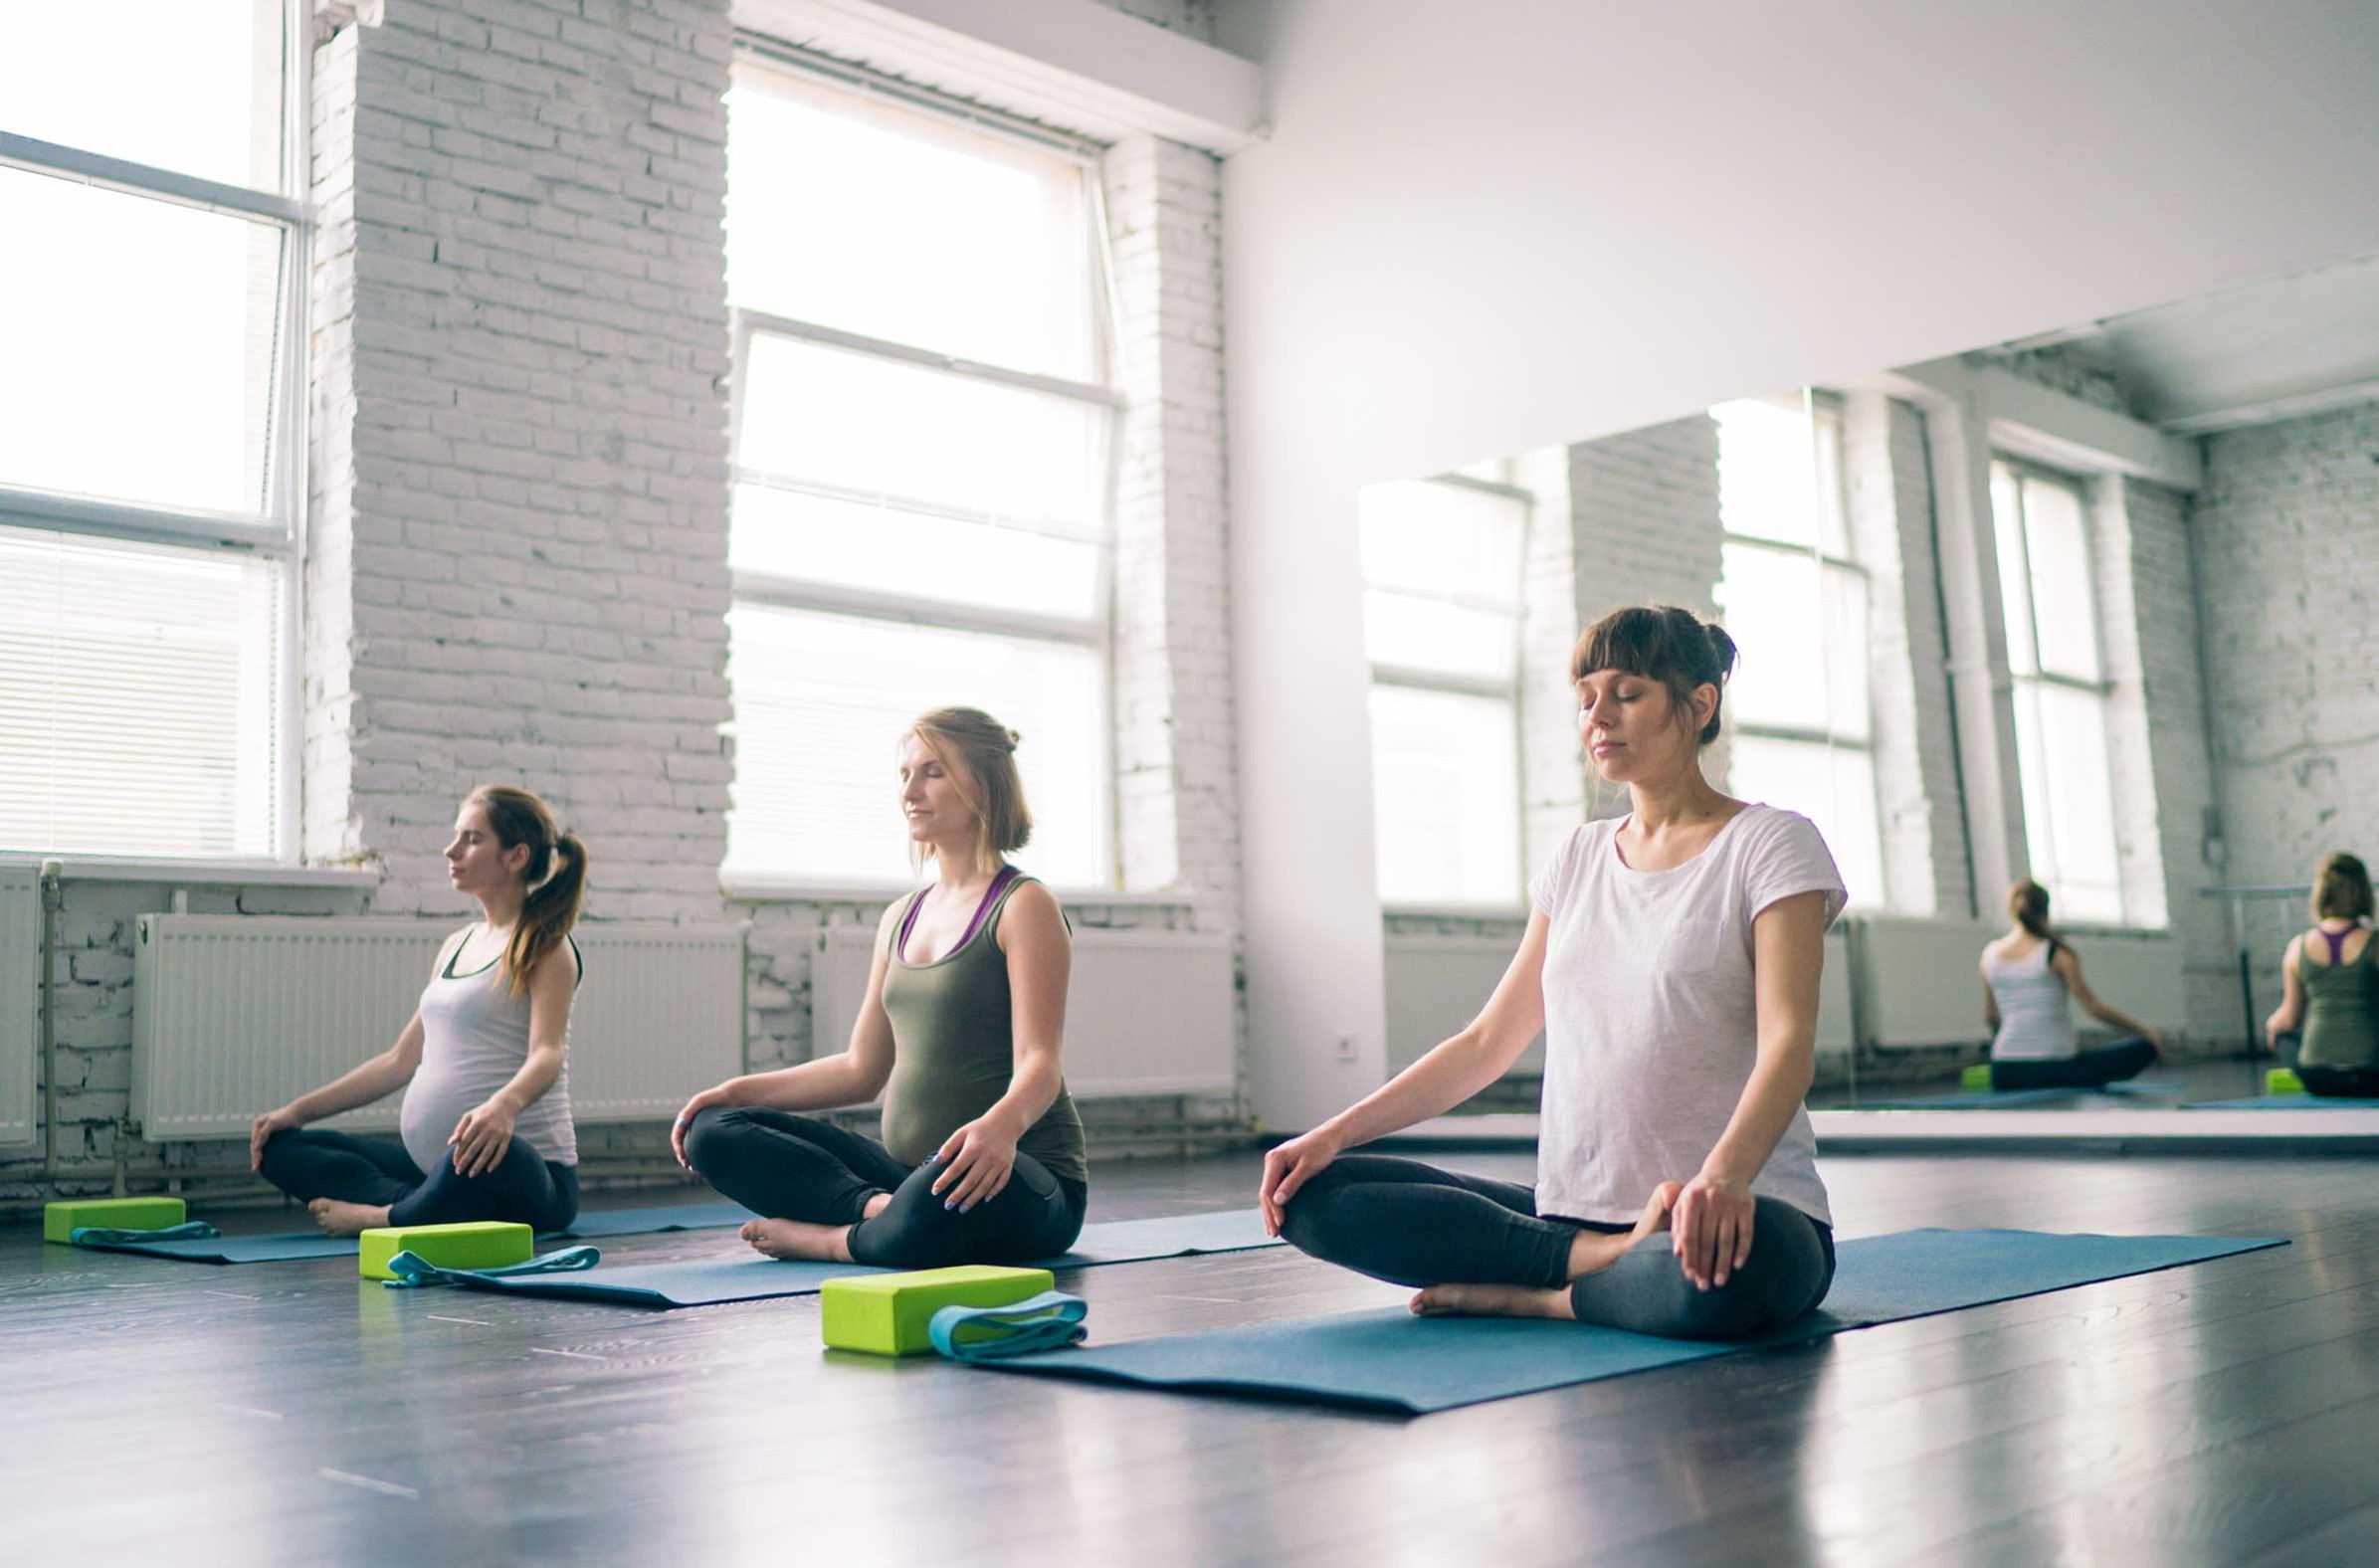 AM yoga & med.  tues 10am / sat 9:15